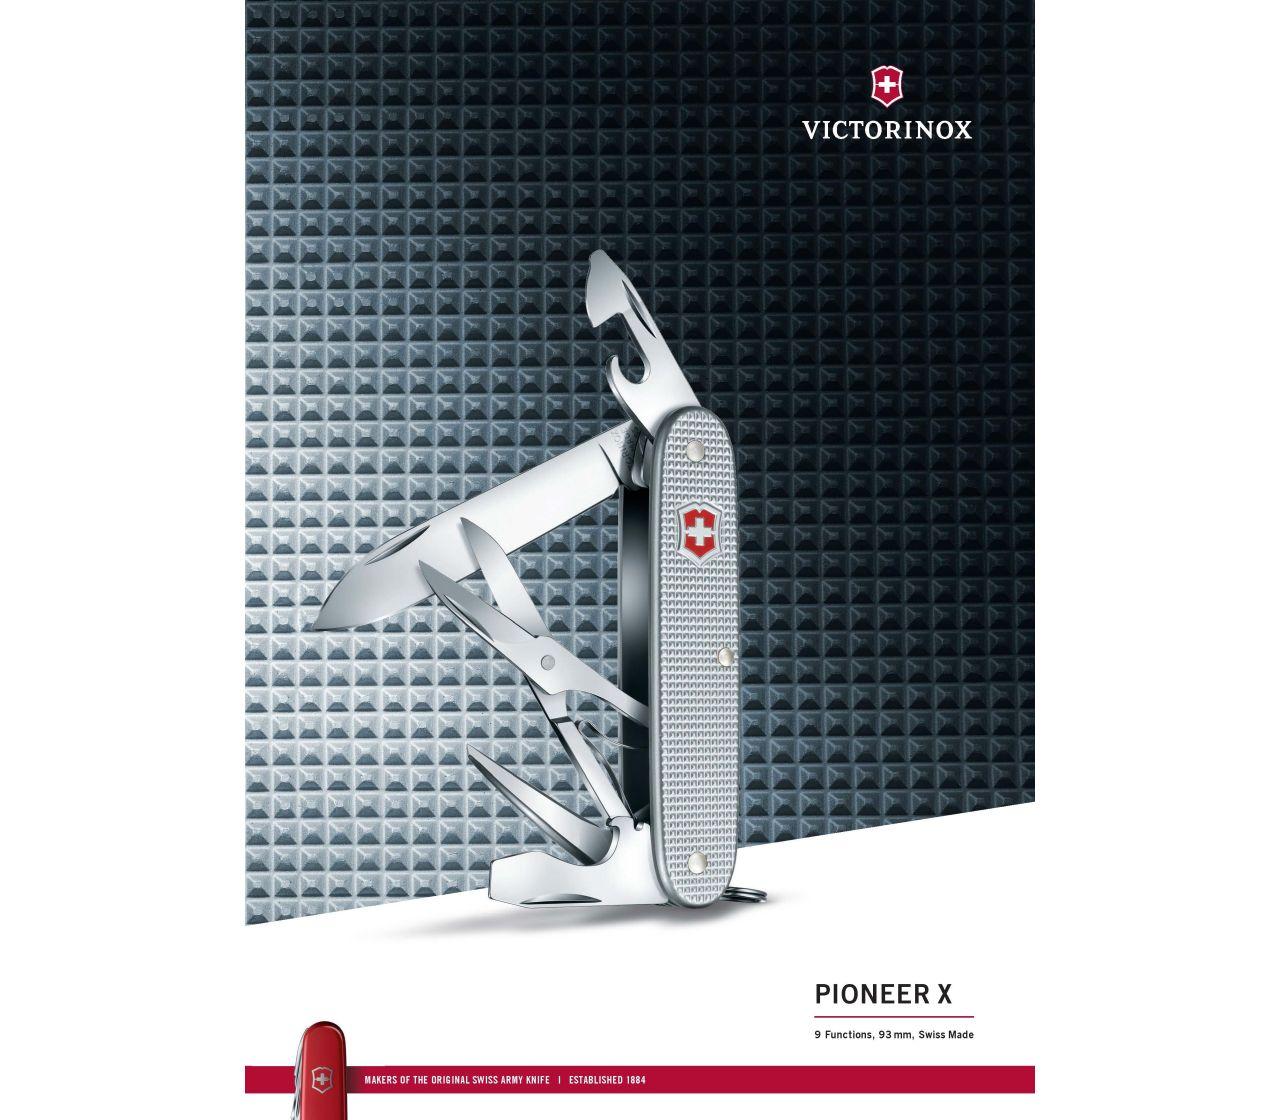 Victorinox Pioneer X